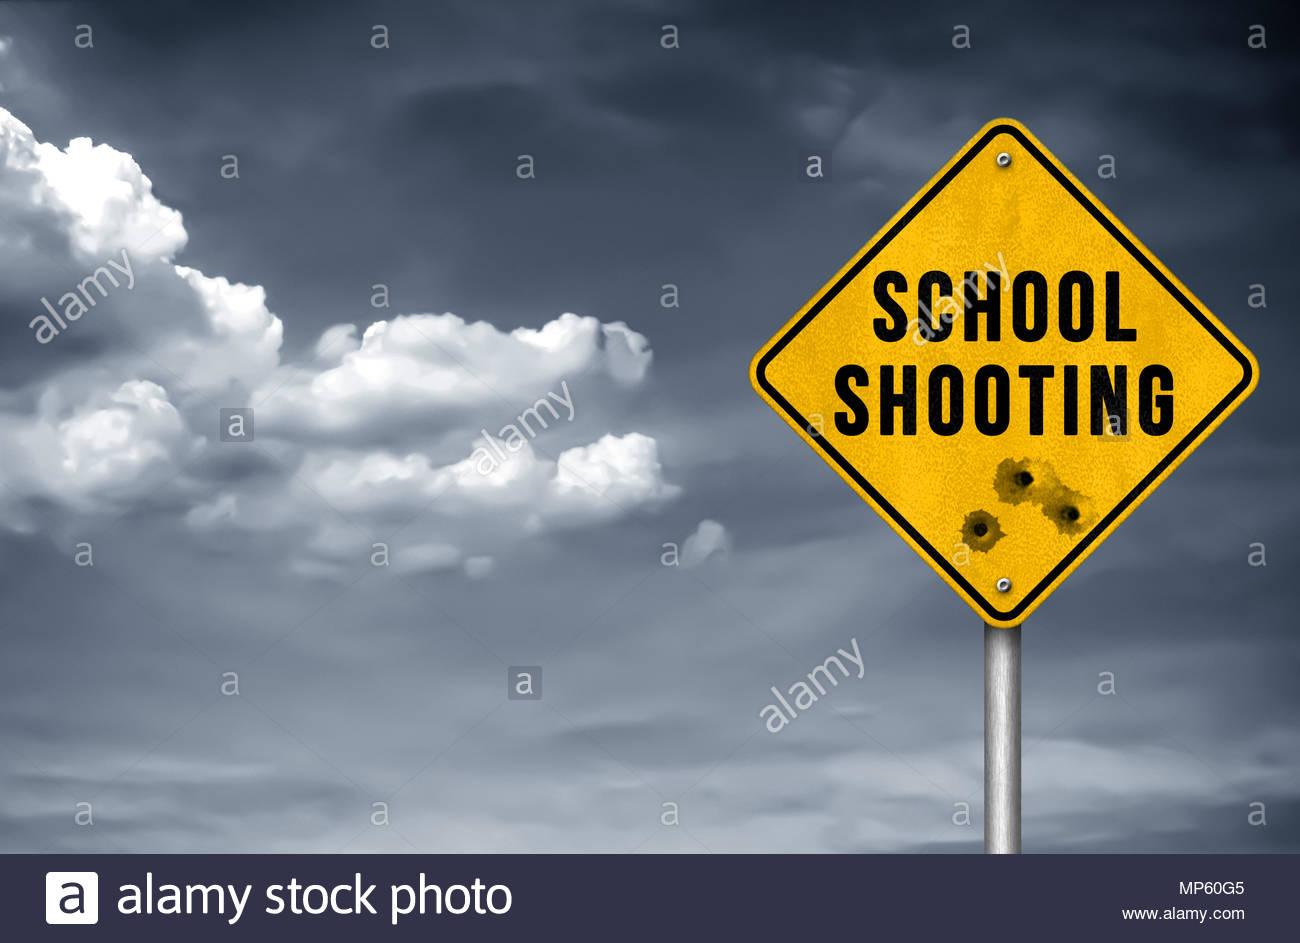 School Shooting - road sign - Stock Image